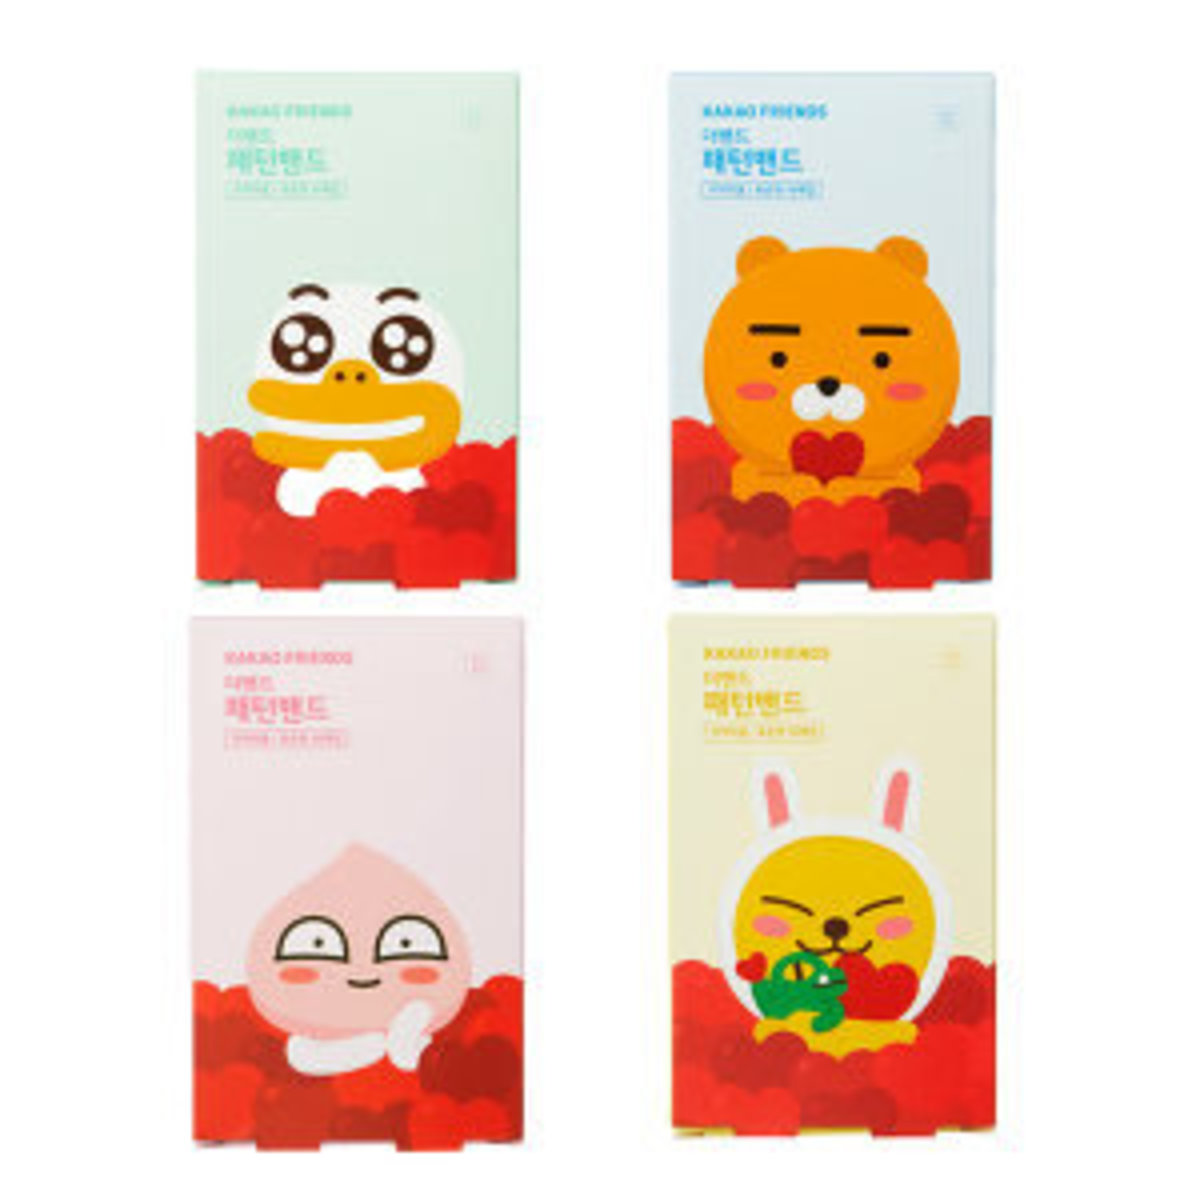 ATEX - Kakao Friends 膠布 (普通型) (16片裝) **貨品顏色將隨機發出** [平行進口]